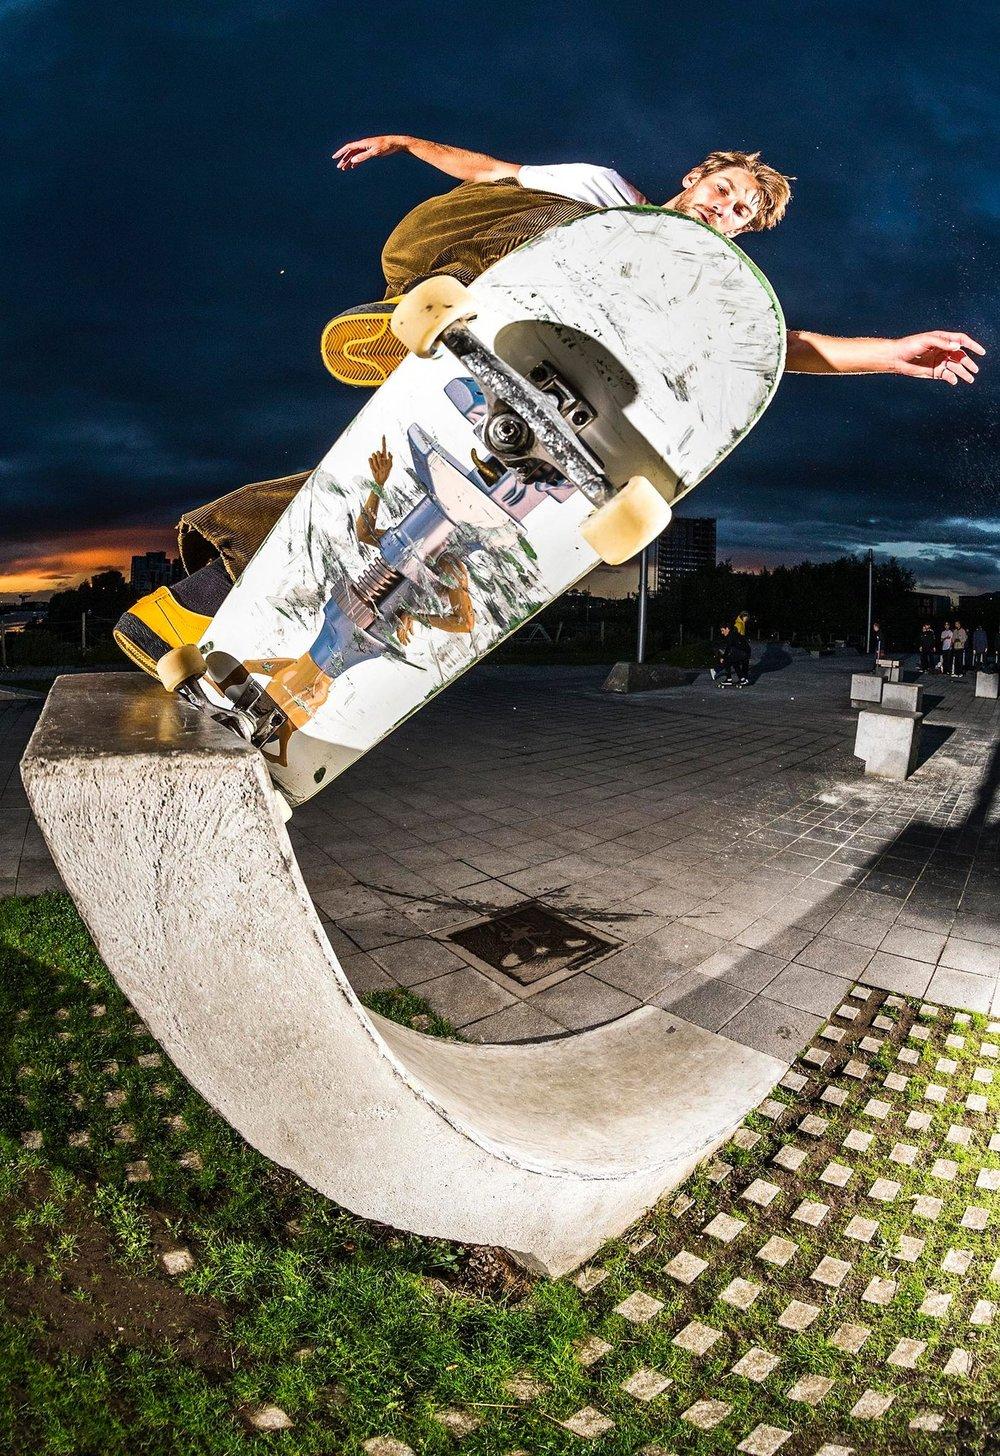 Chris_Jones_Pivot_Fakie_Transport_Musuem_Glasgow_photo_Reece_Leung_Welcome_Skate_Store_Interview_2048x2048.JPG